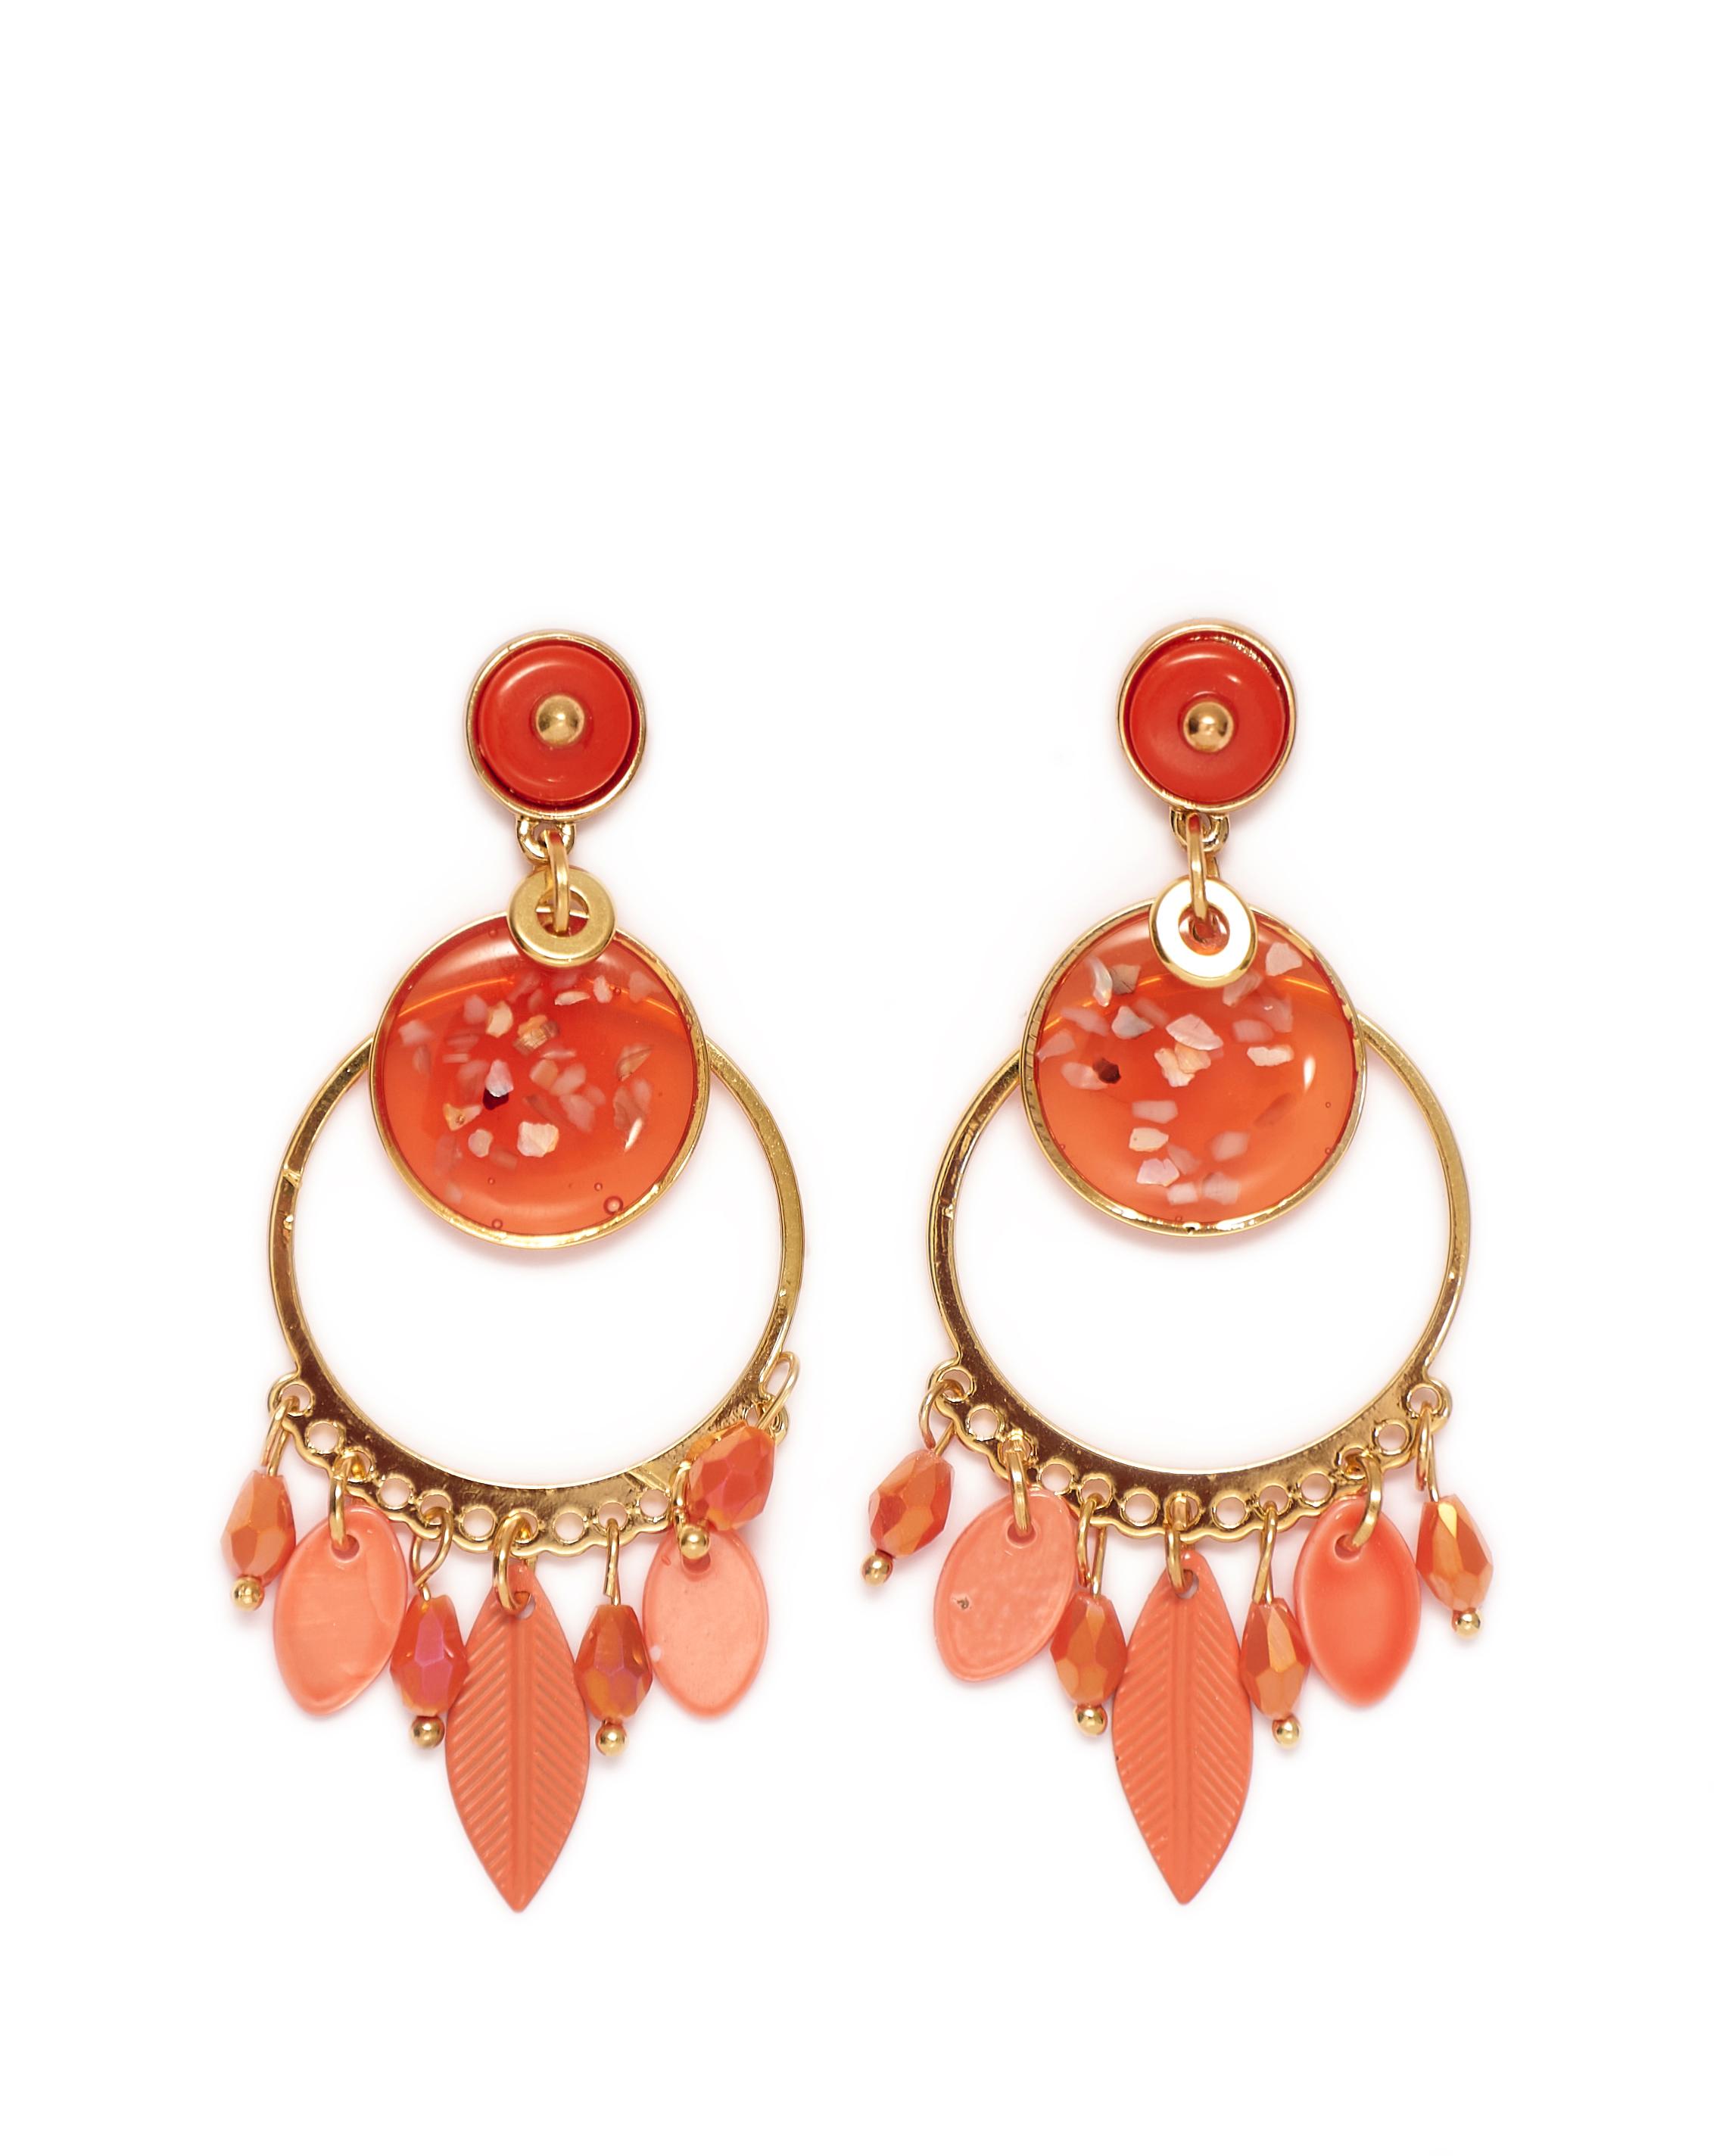 Bijoux Femme - Boucle D'Oreille Orange Jina - Bo88923